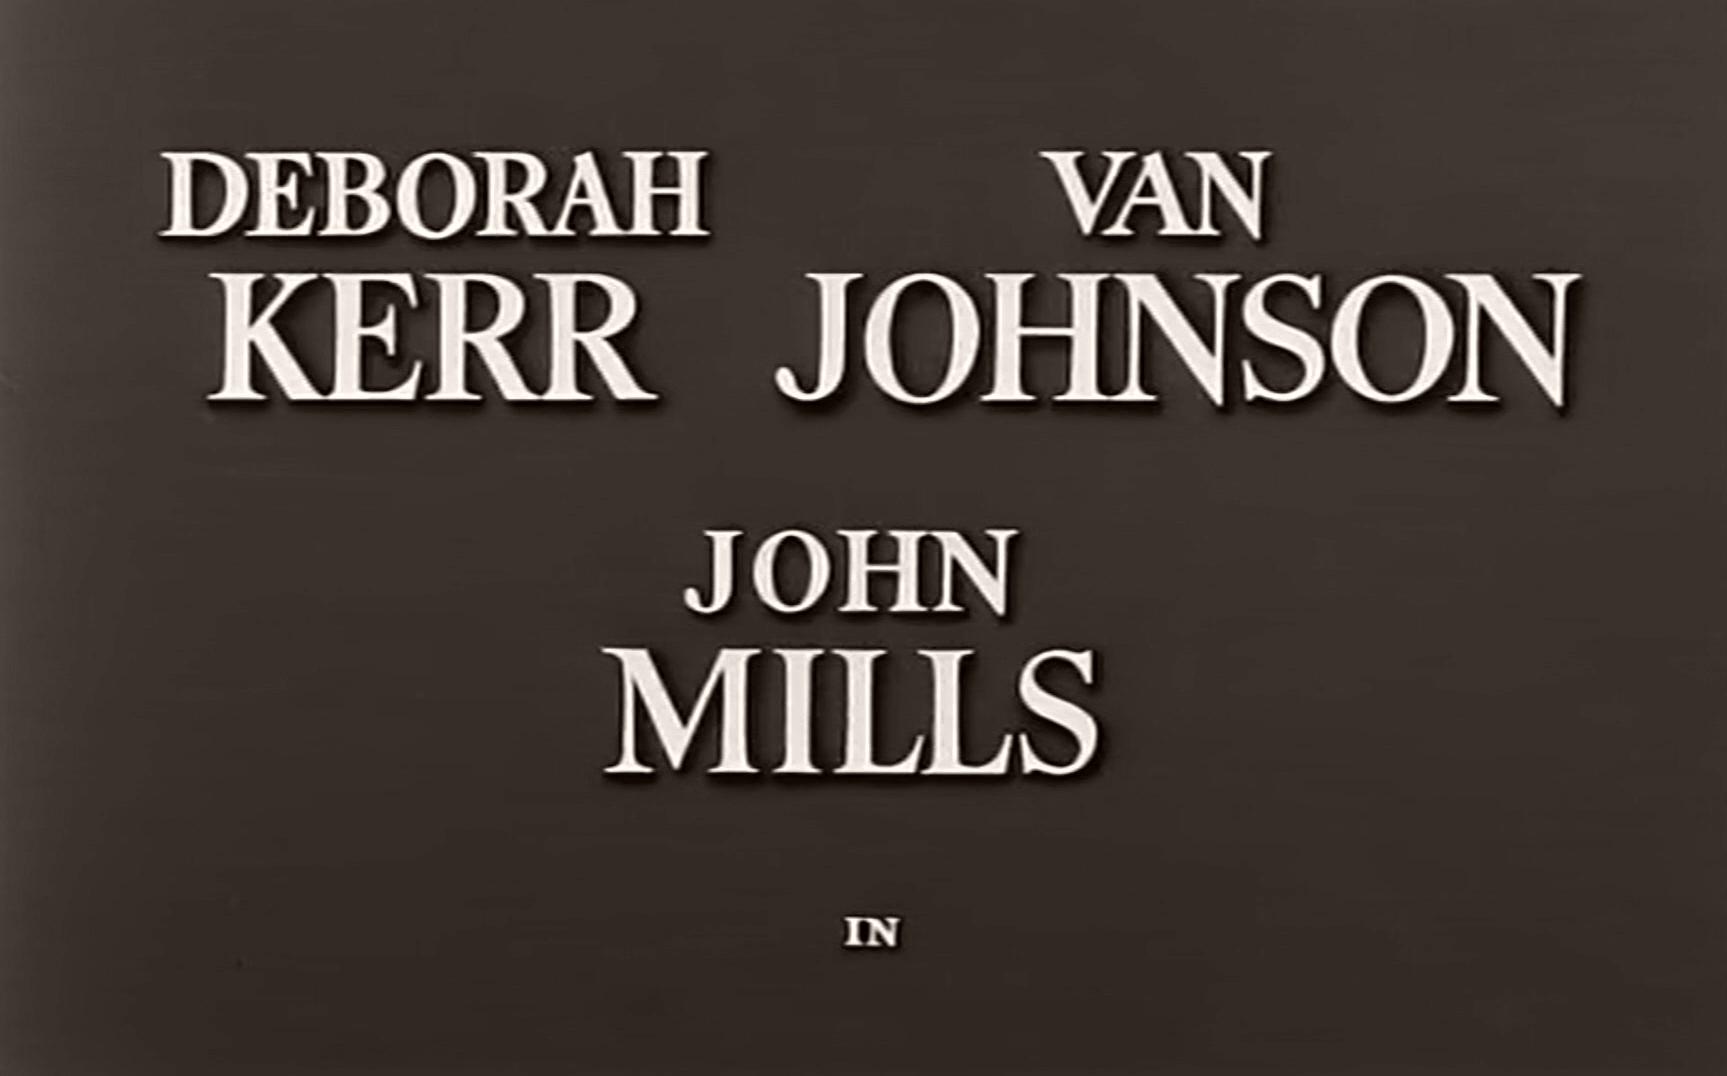 Main title from The End of the Affair (1955) (2). Deborah Kerr Van Johnson, John Mills in